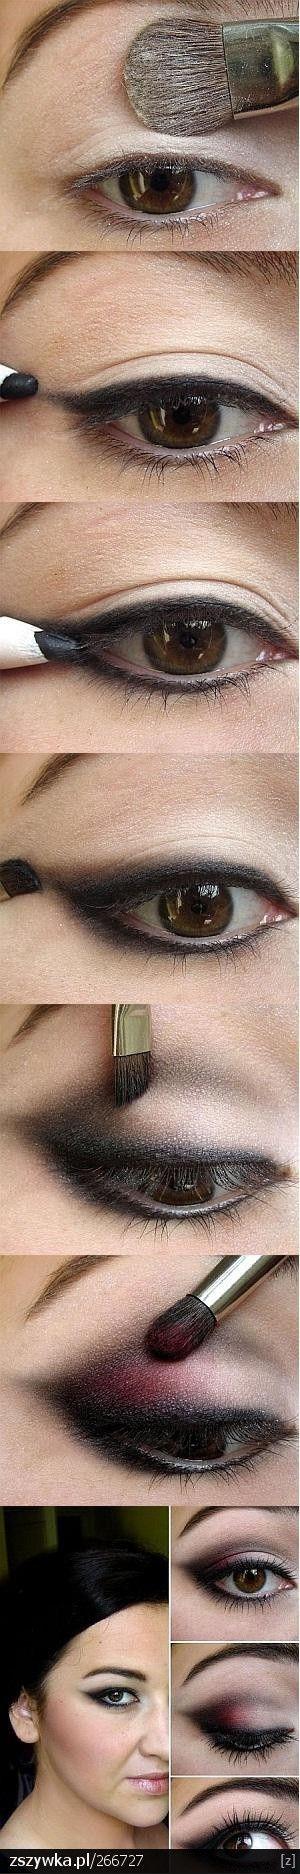 Smokey eyes-- I LOVE pink and black eye make up!!